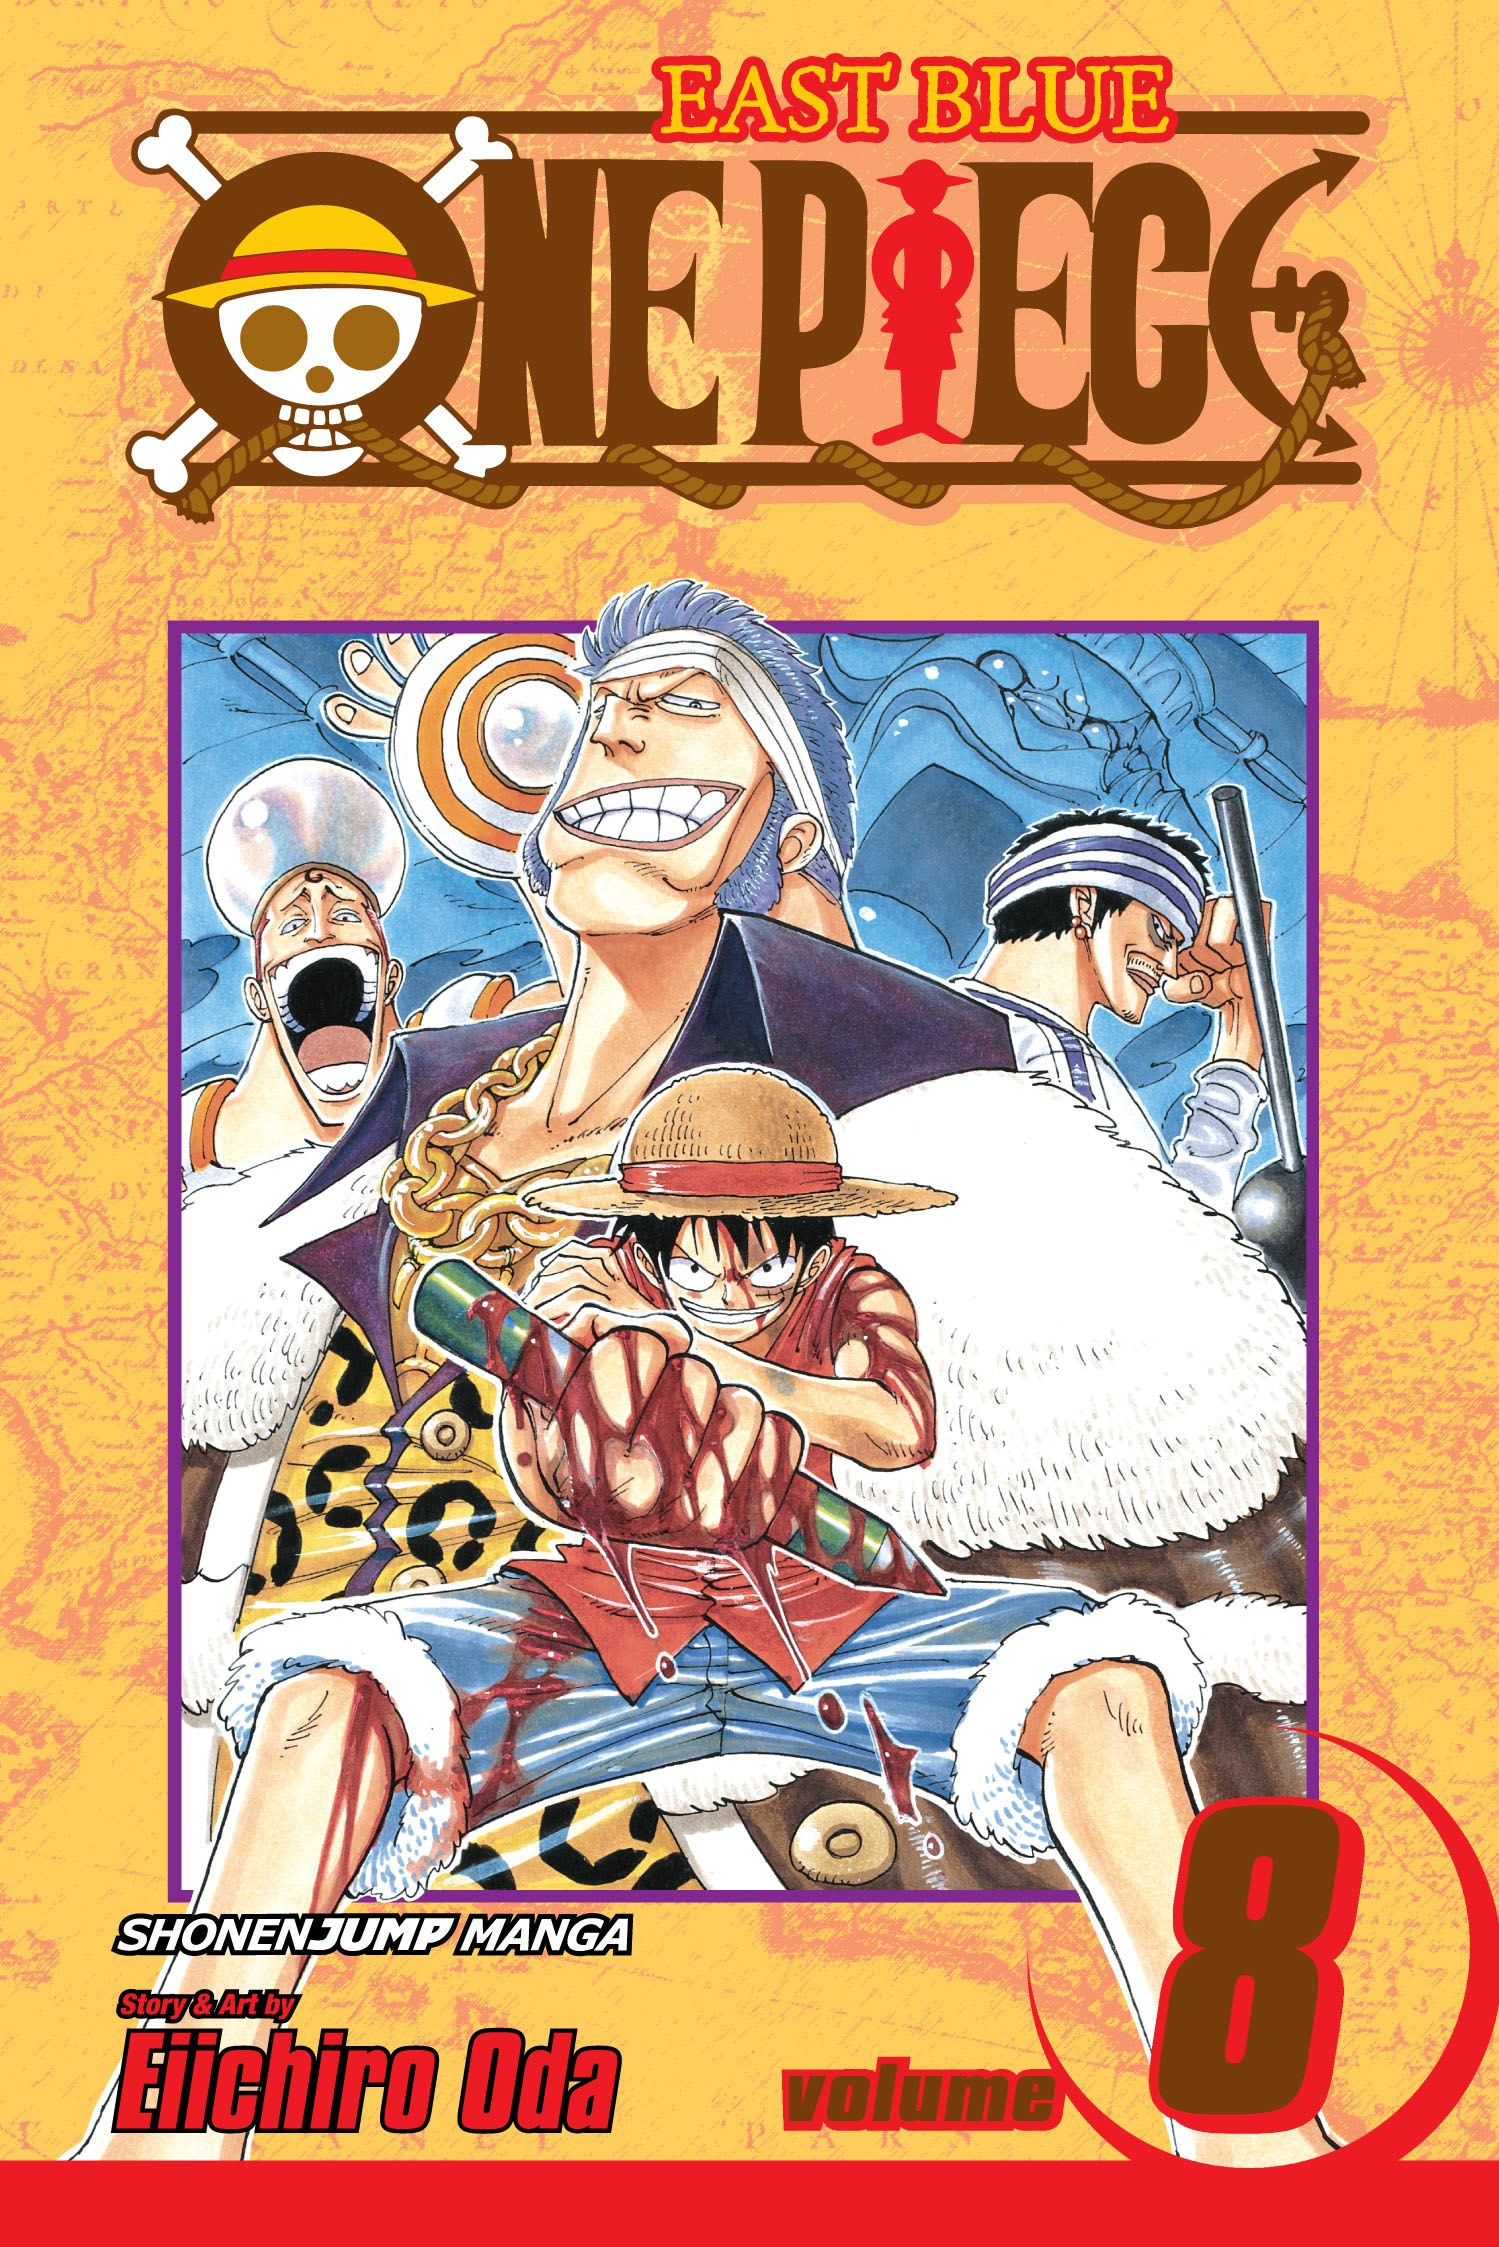 Eiichiro Paperback Book The Fast One Piece: v : Volume 13 by Oda 13 One Piece